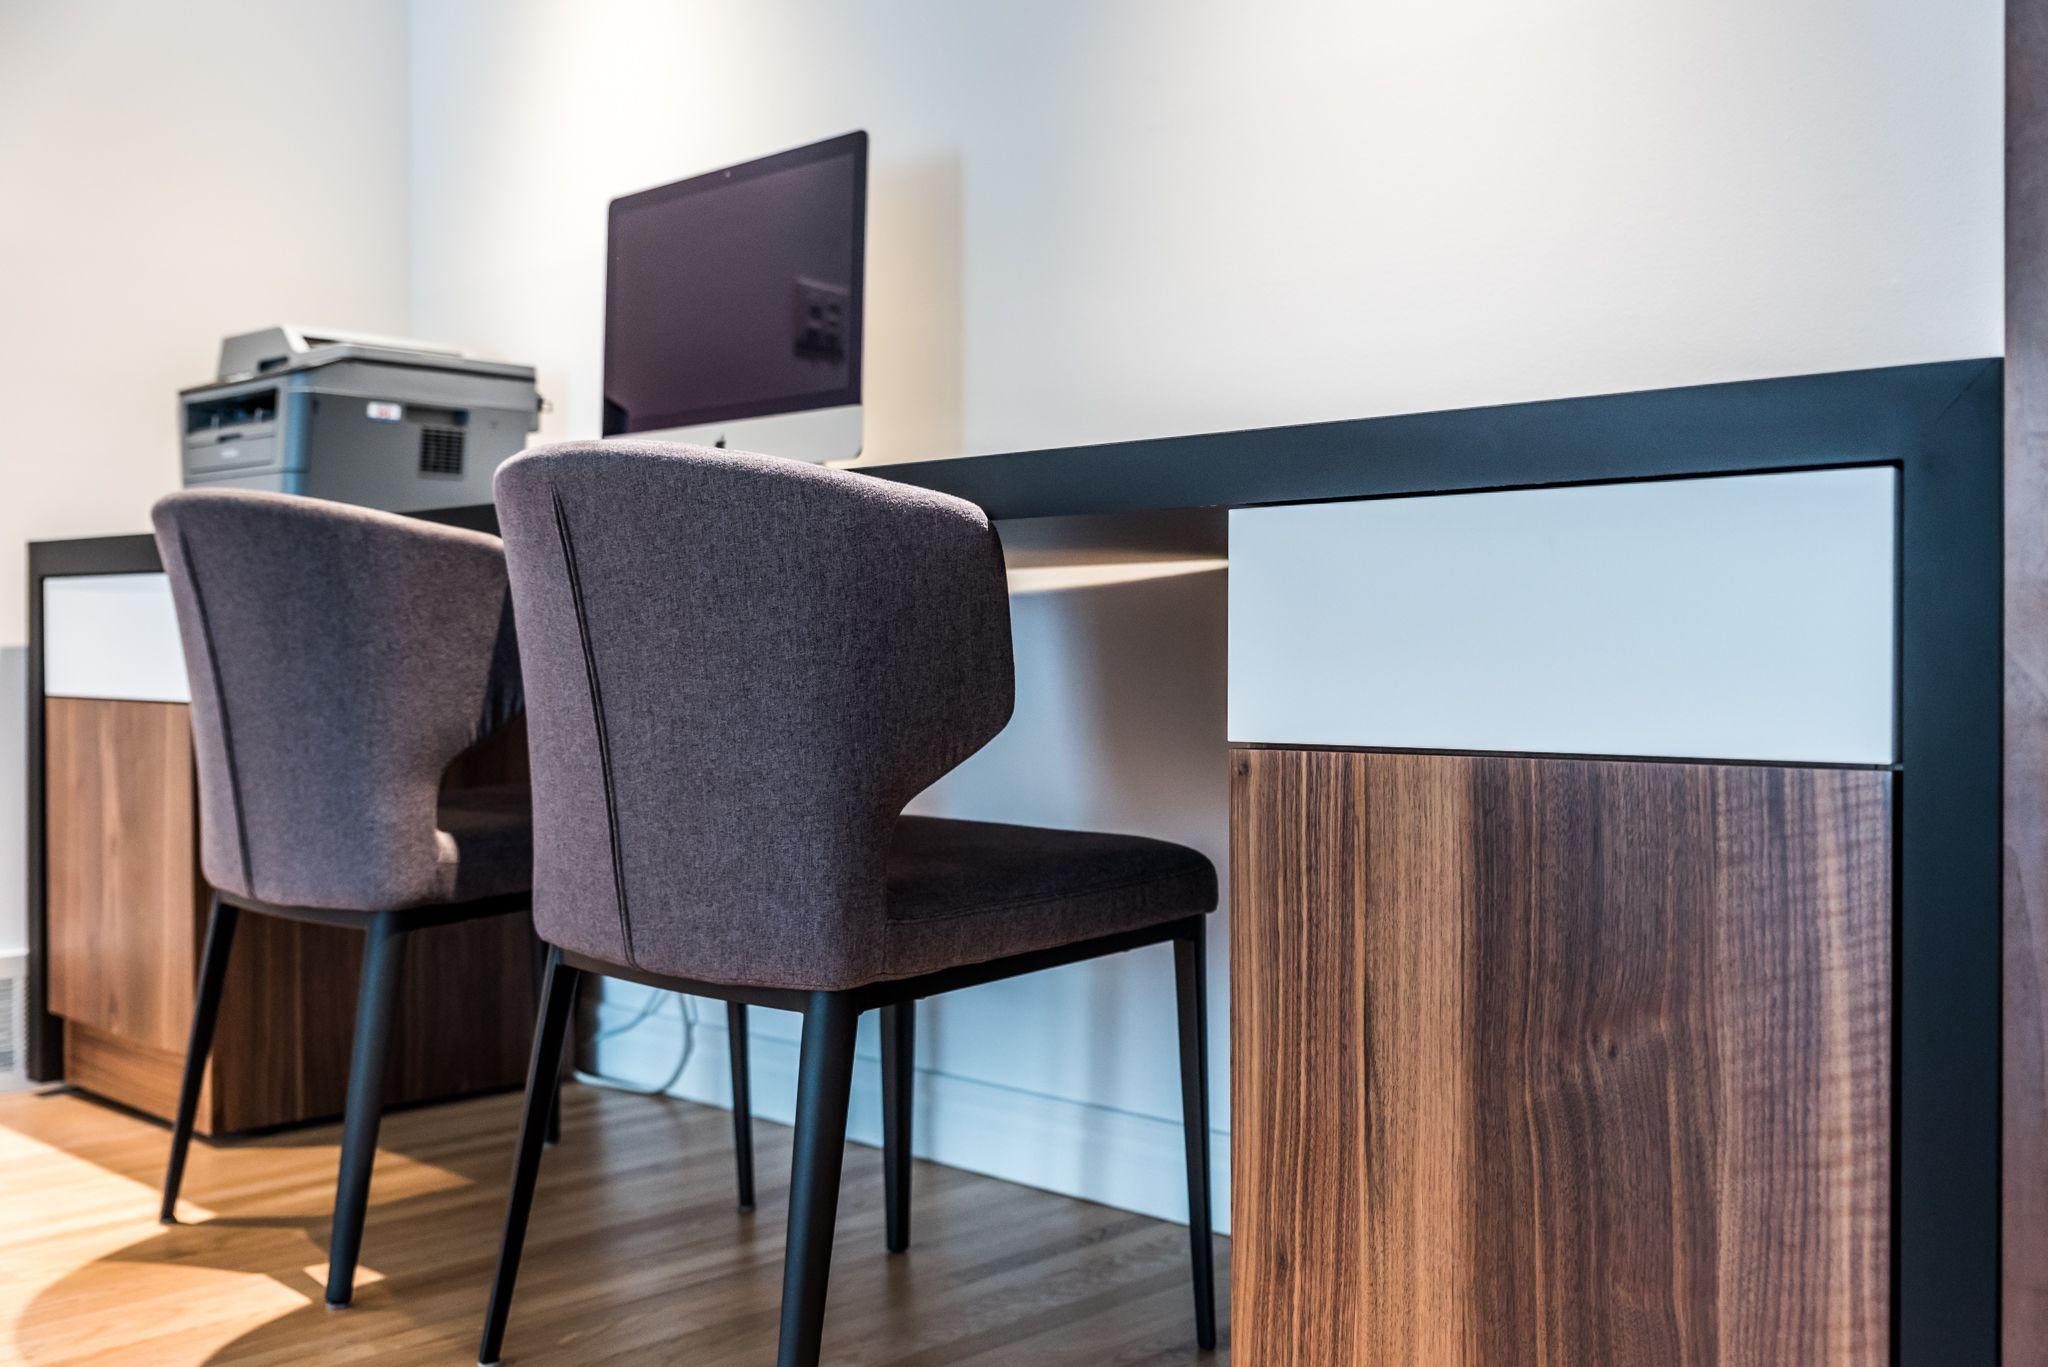 projet de bureau sur mesure fenix noir mat laque blanche noyer projet de claudia b rub. Black Bedroom Furniture Sets. Home Design Ideas